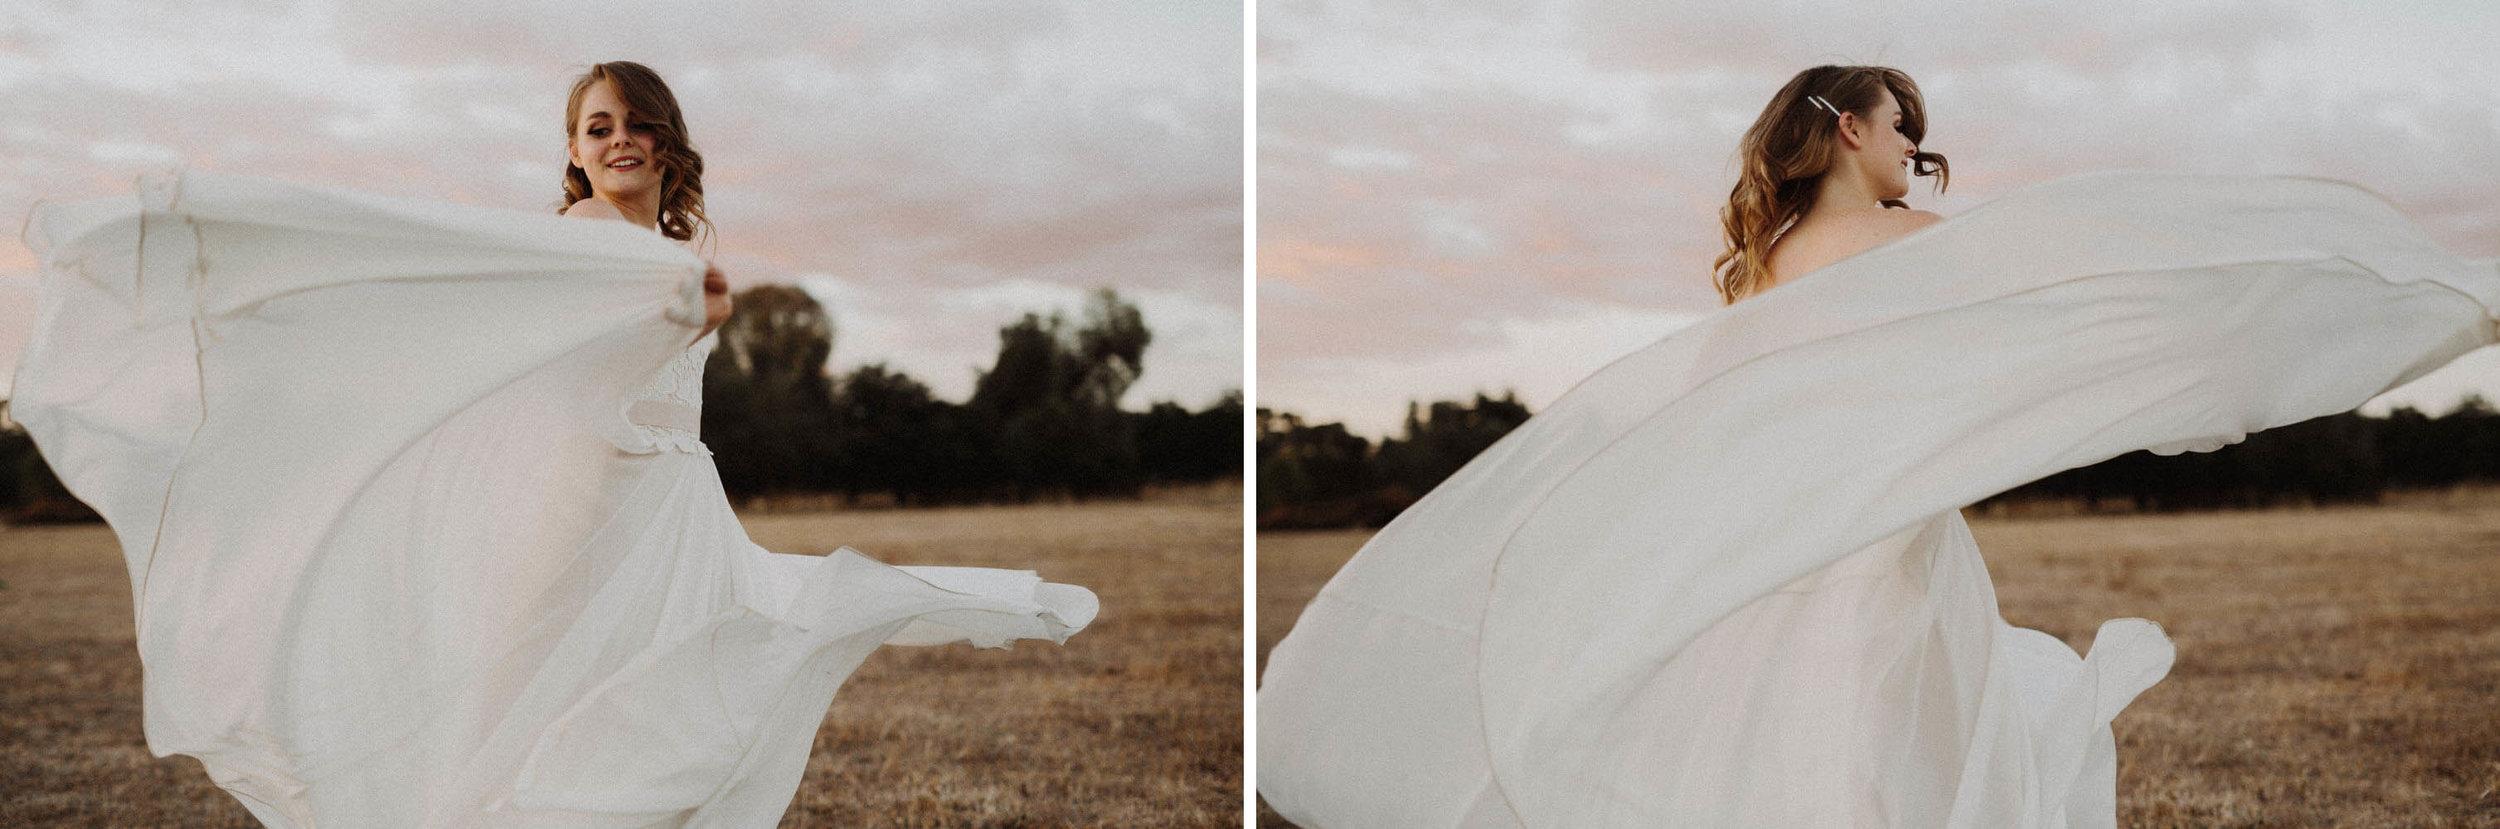 australian-wedding-photography_199(3891)2.jpg